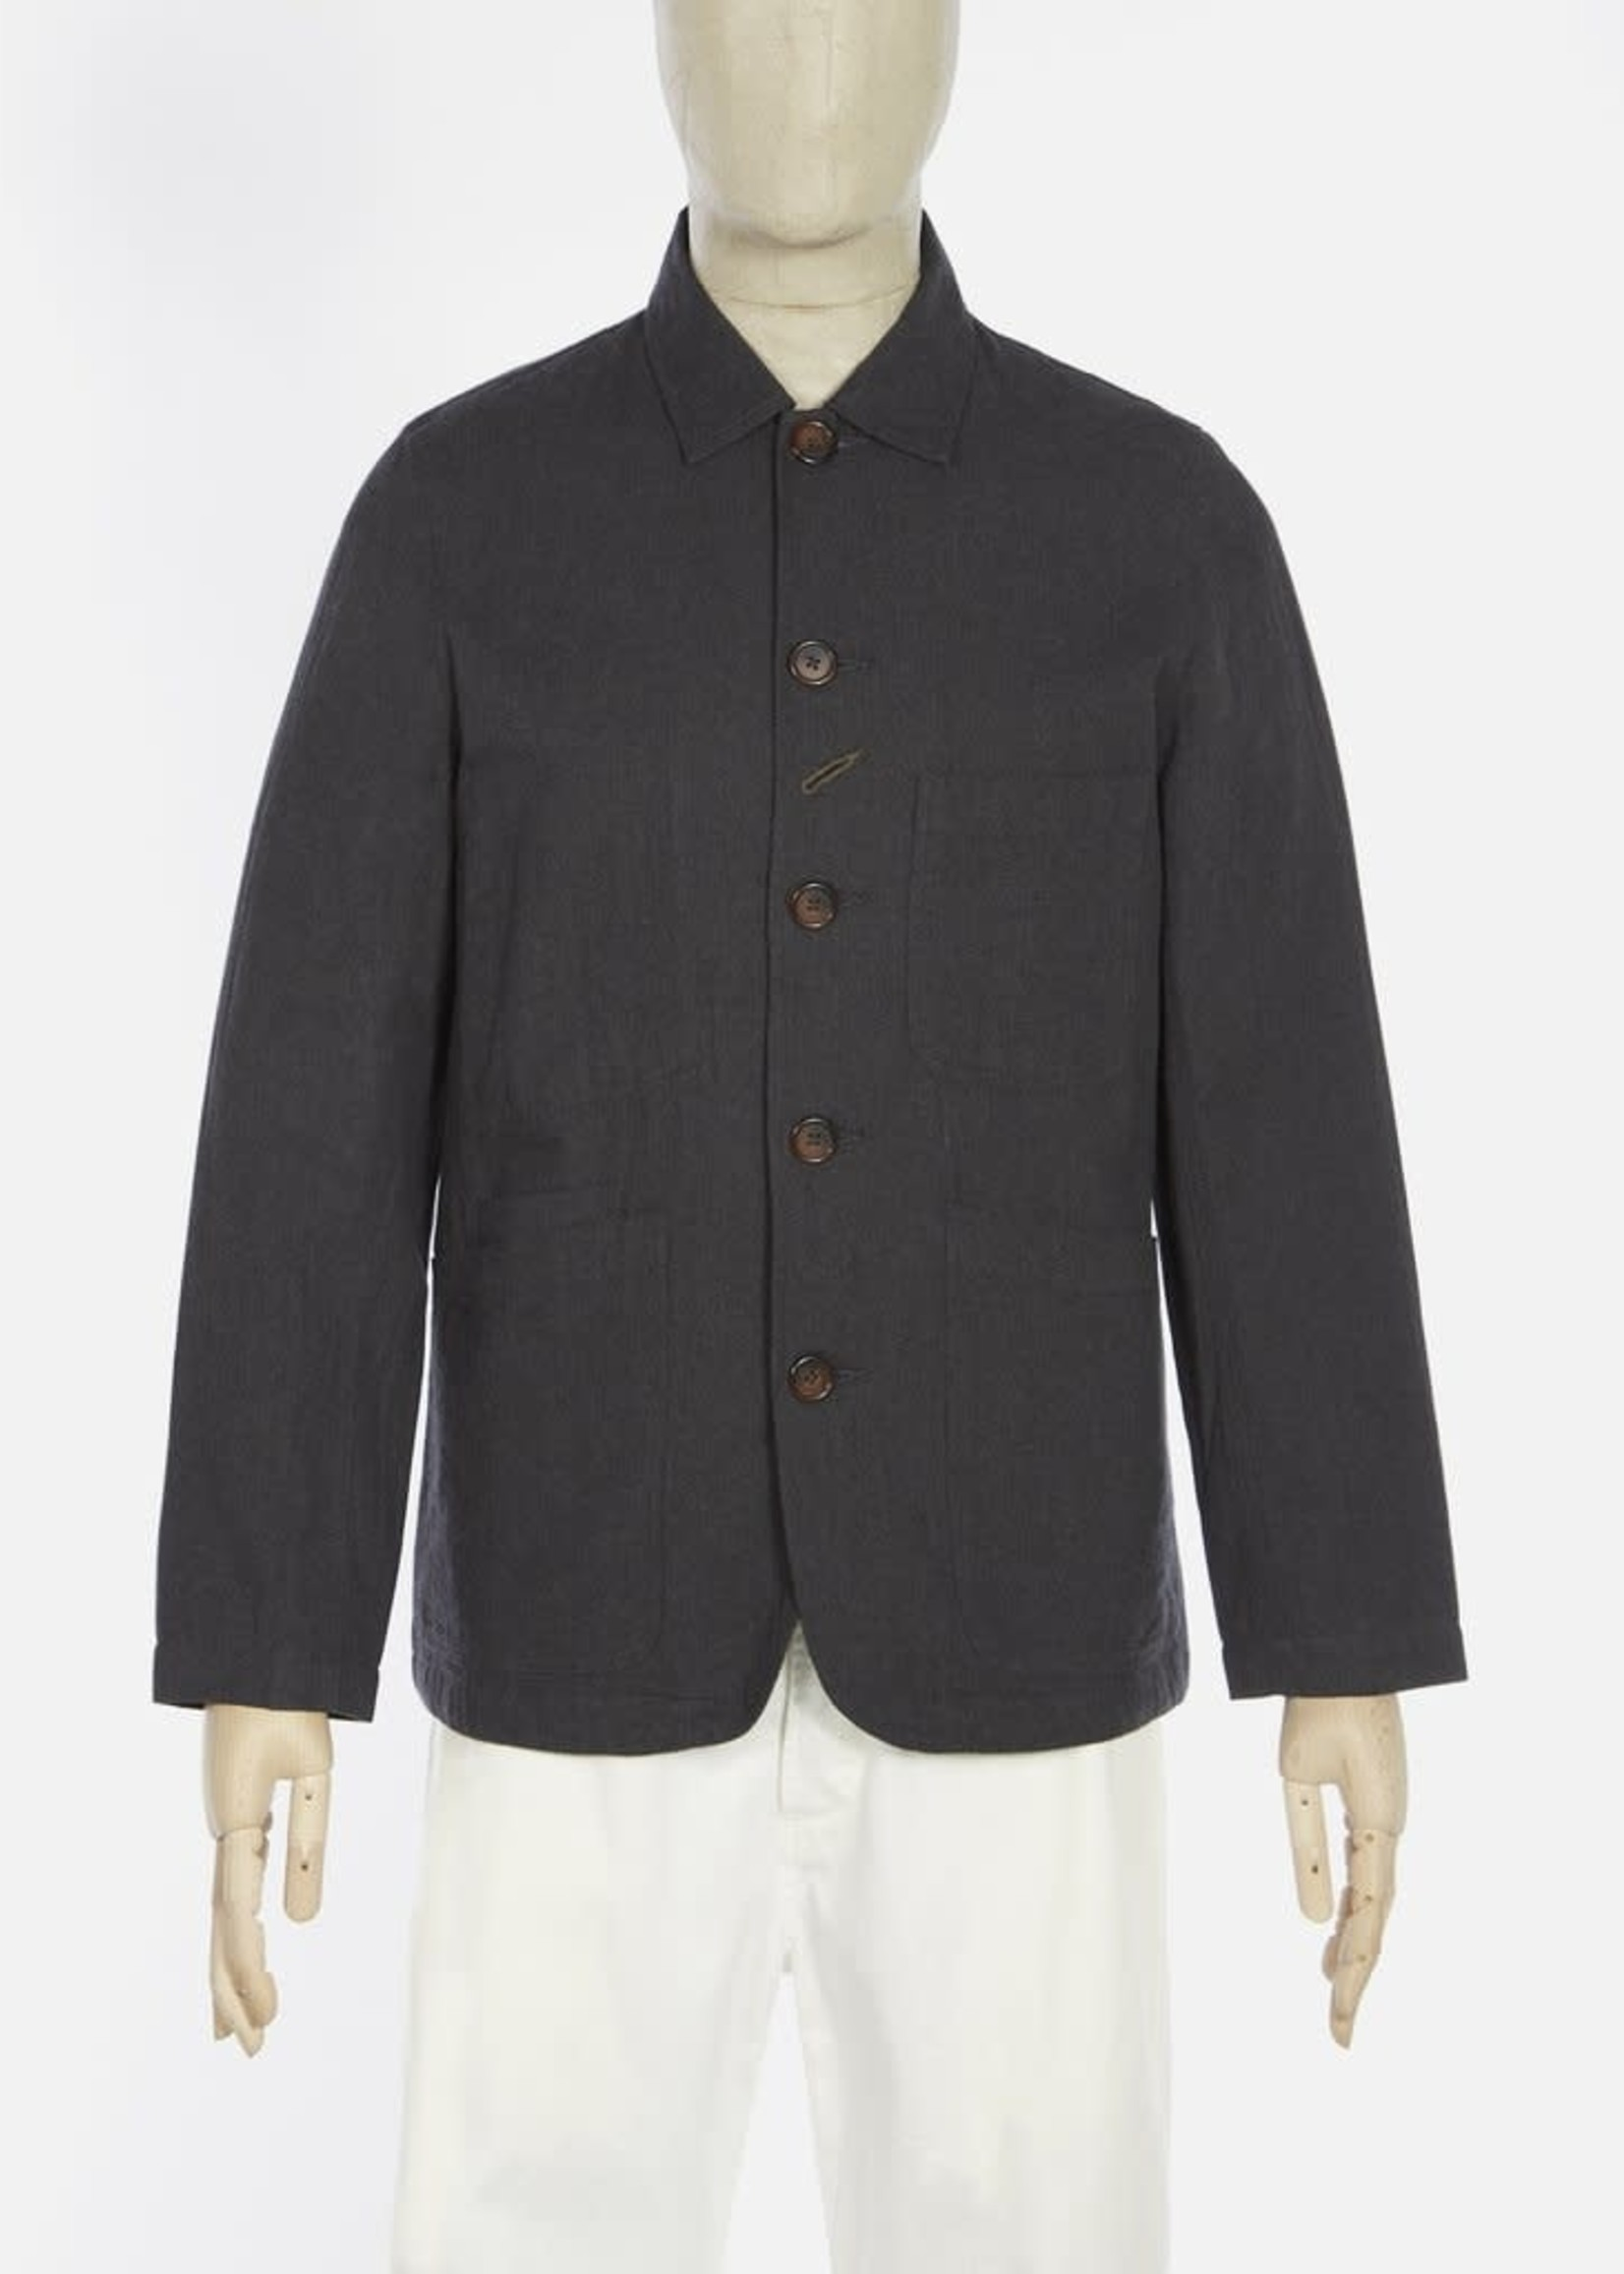 Universal Works Universal Works Bakers Jacket Charcoal Cotton Herringbone